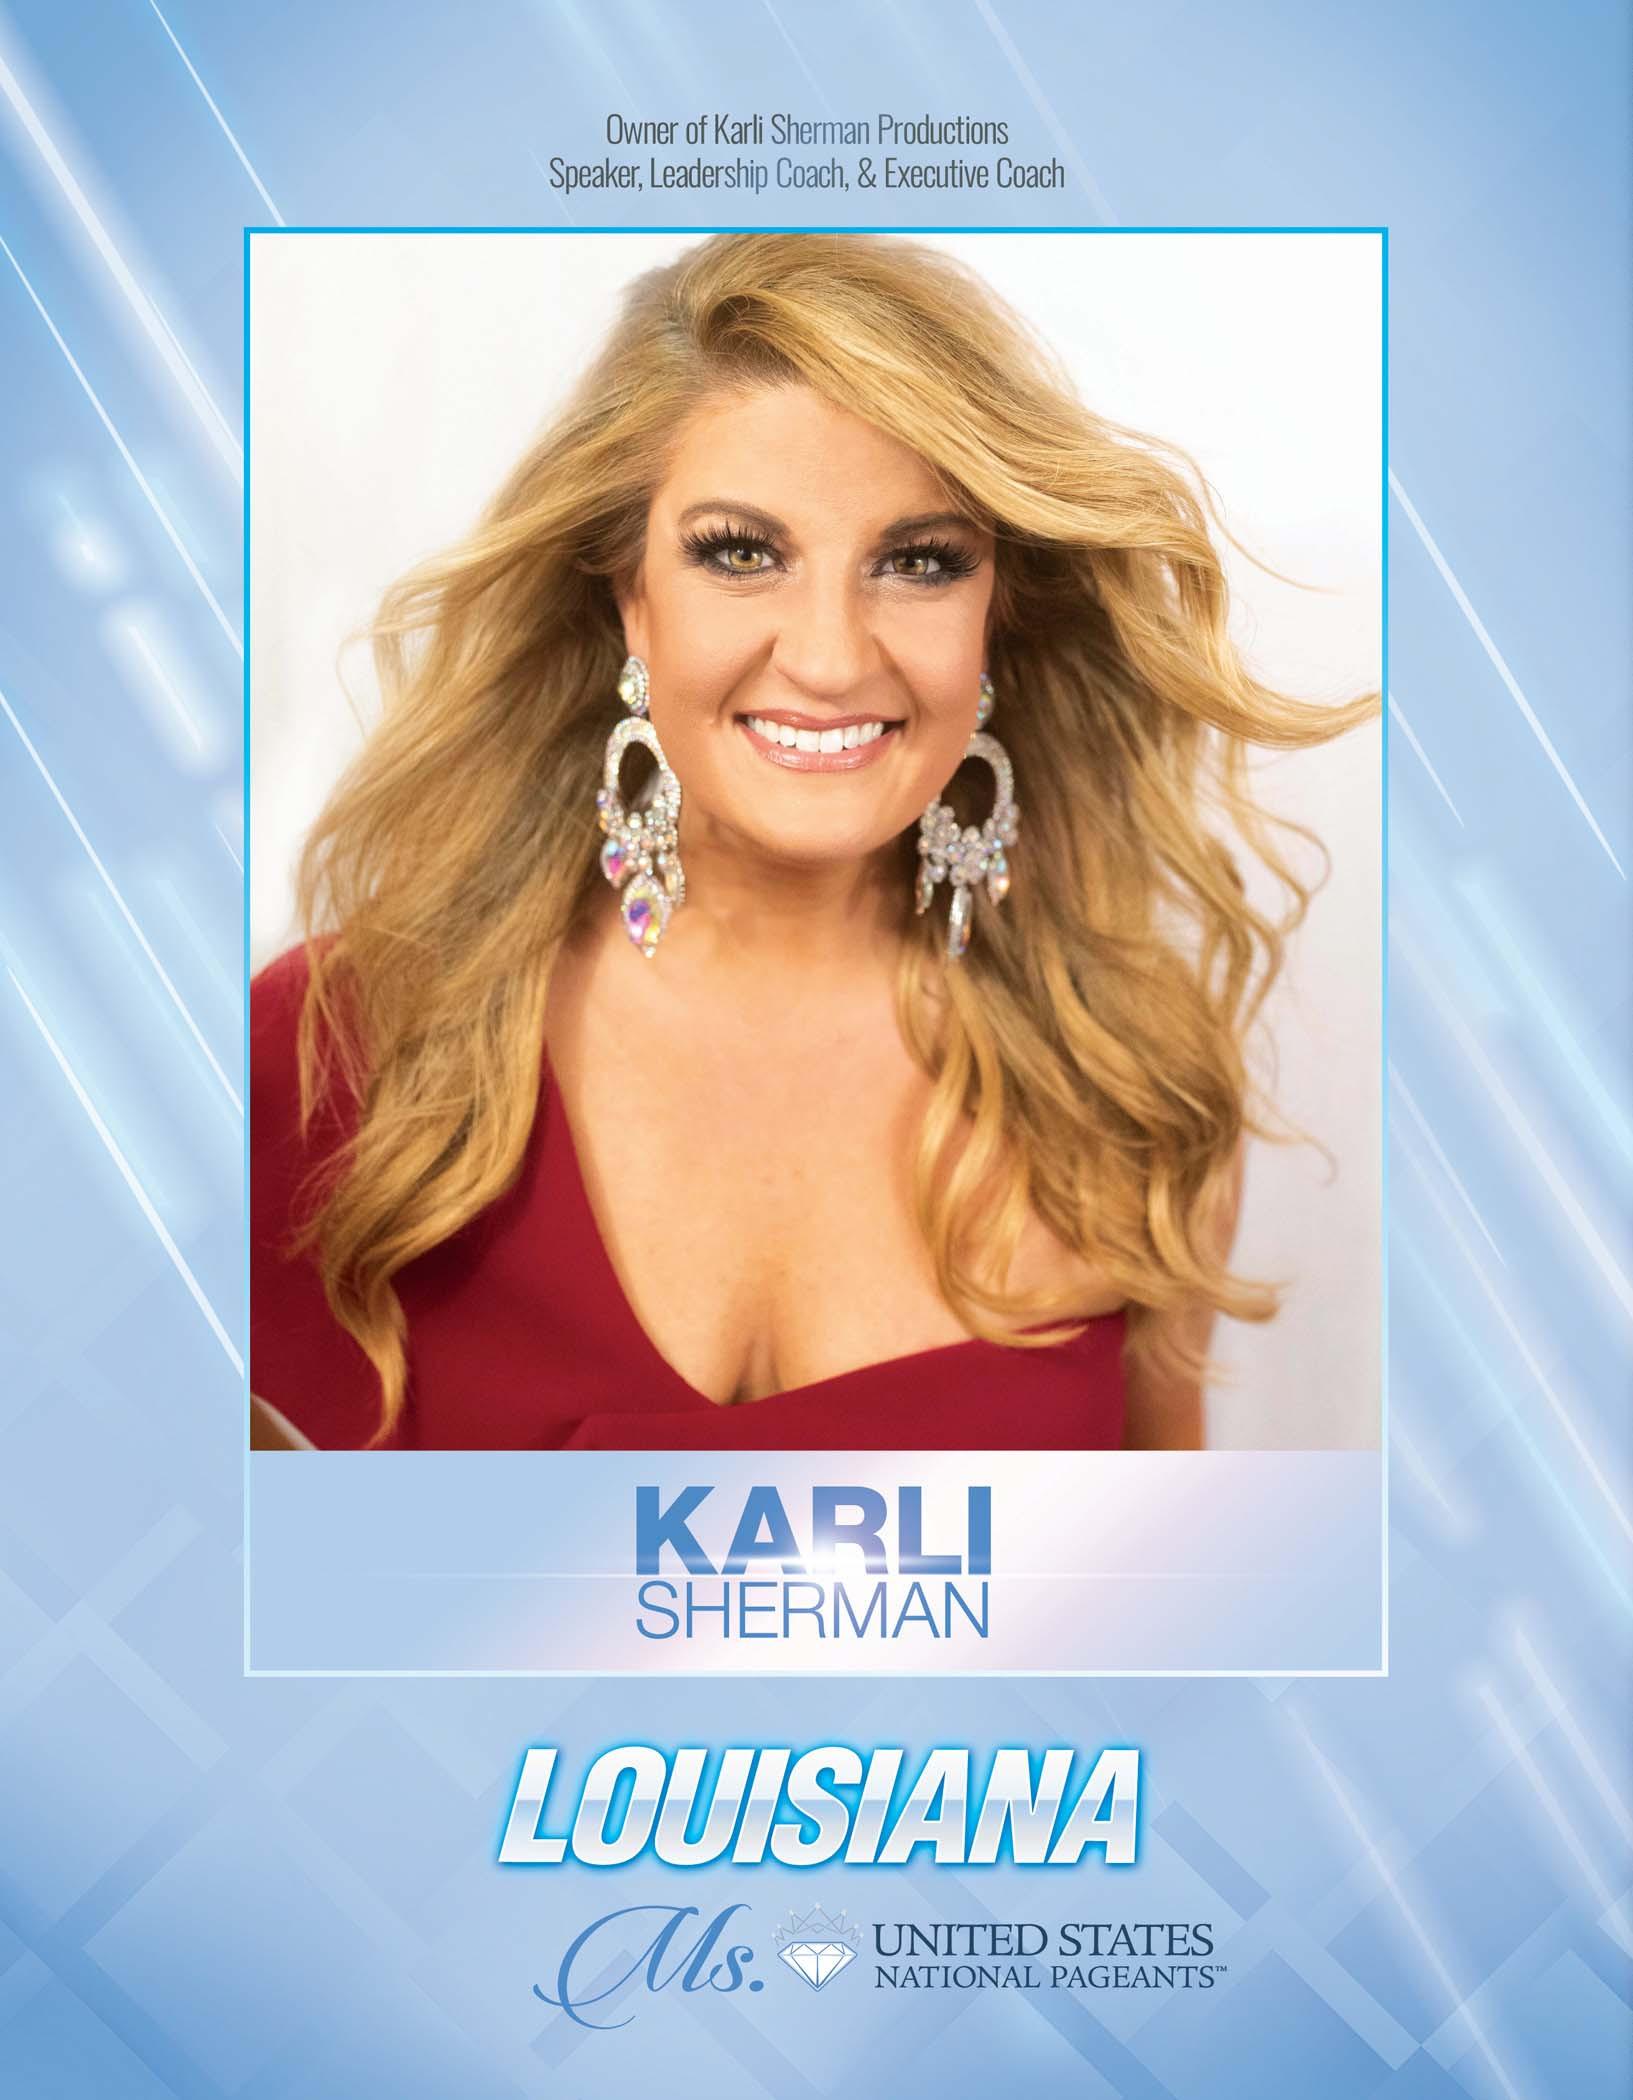 Karli Sherman Ms. Louisiana United States - 2021